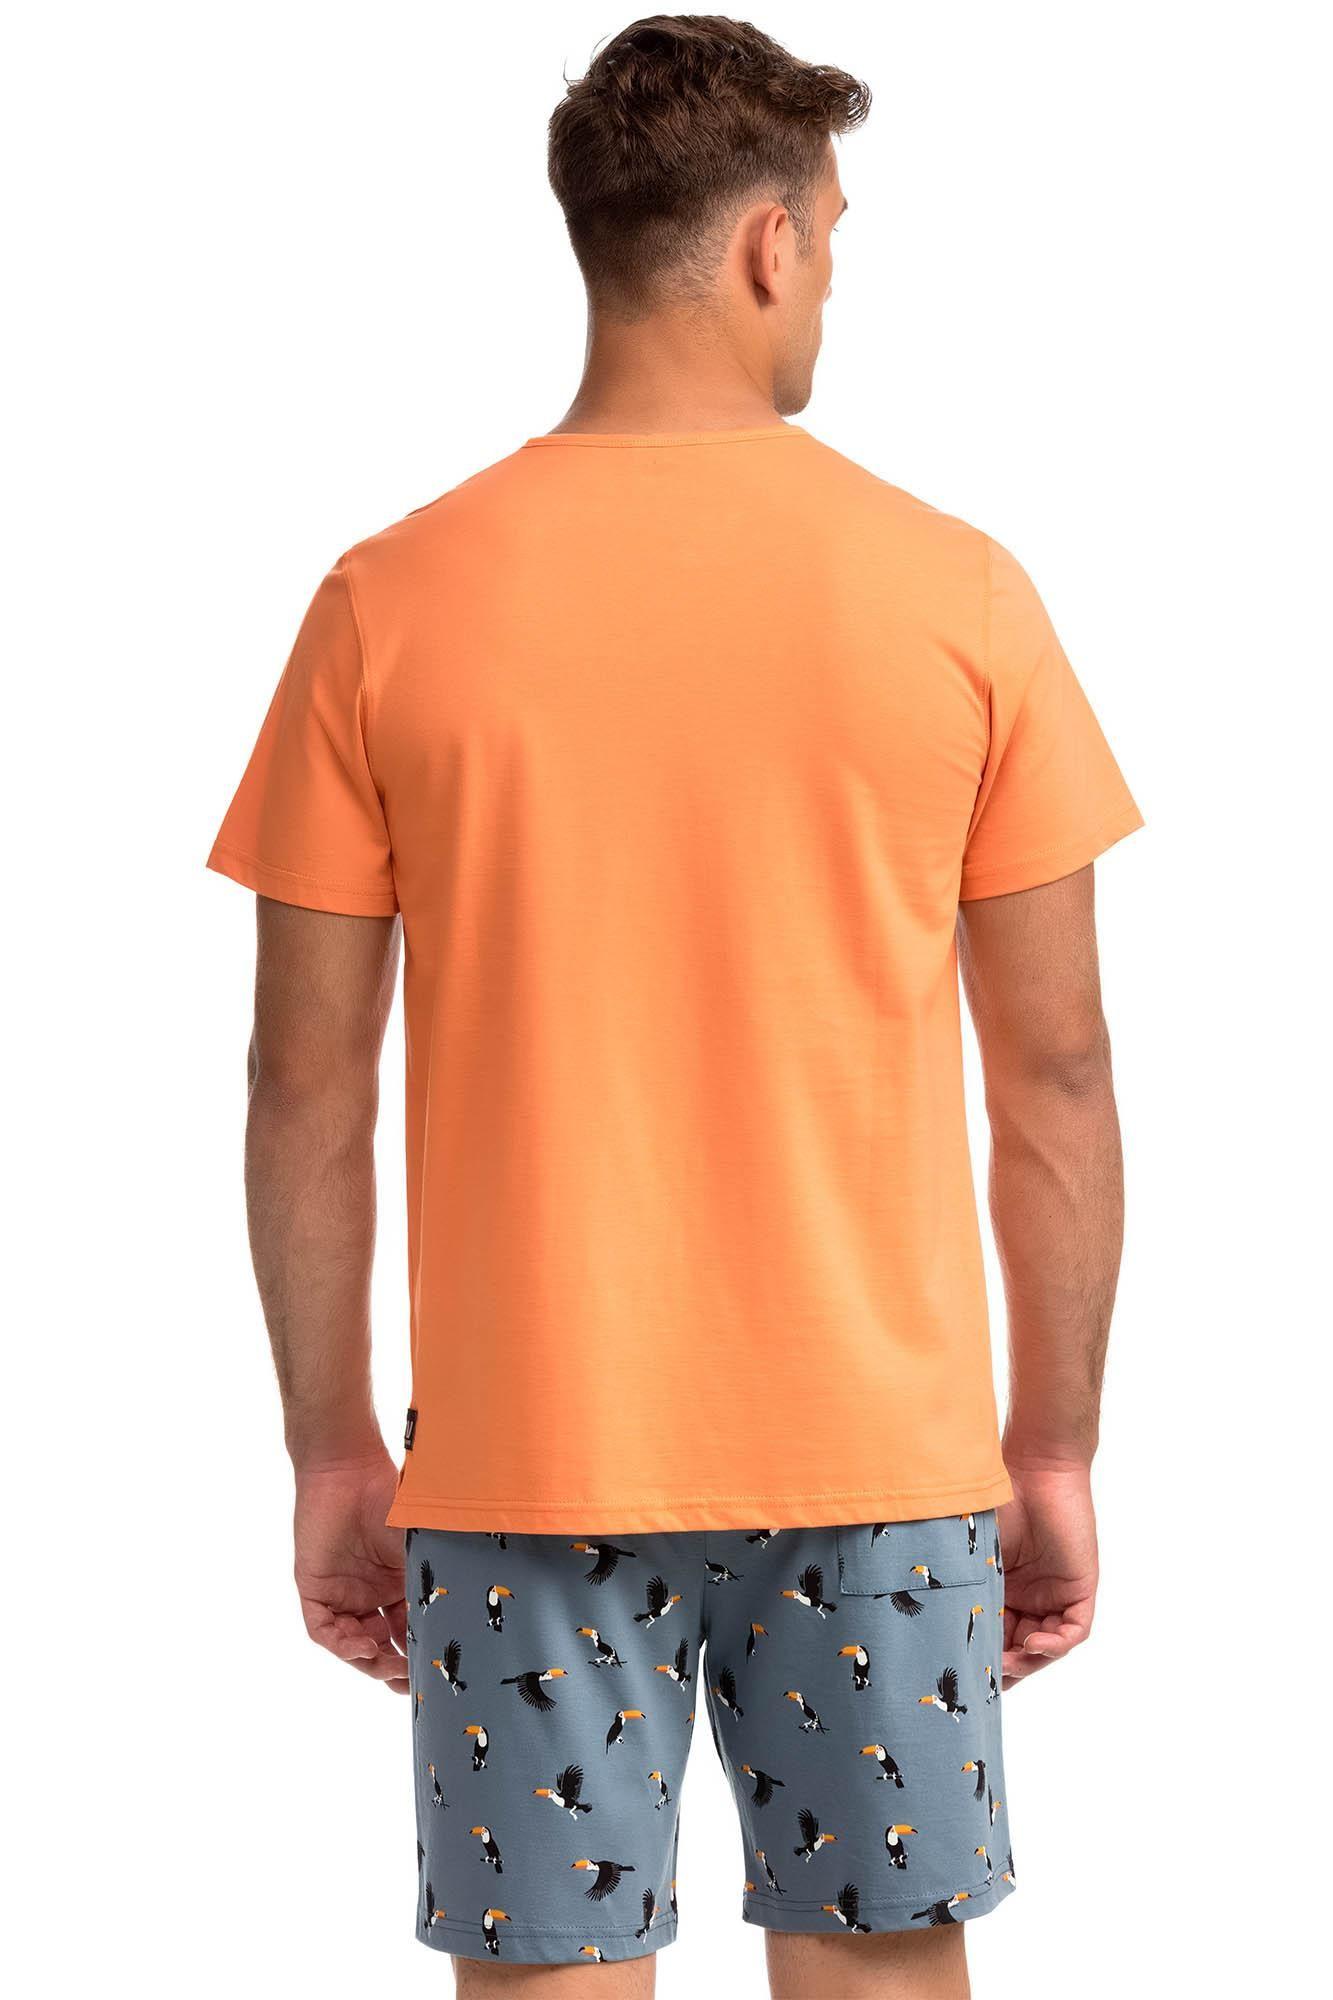 Men's Short-Sleeved Pyjamas Twocan